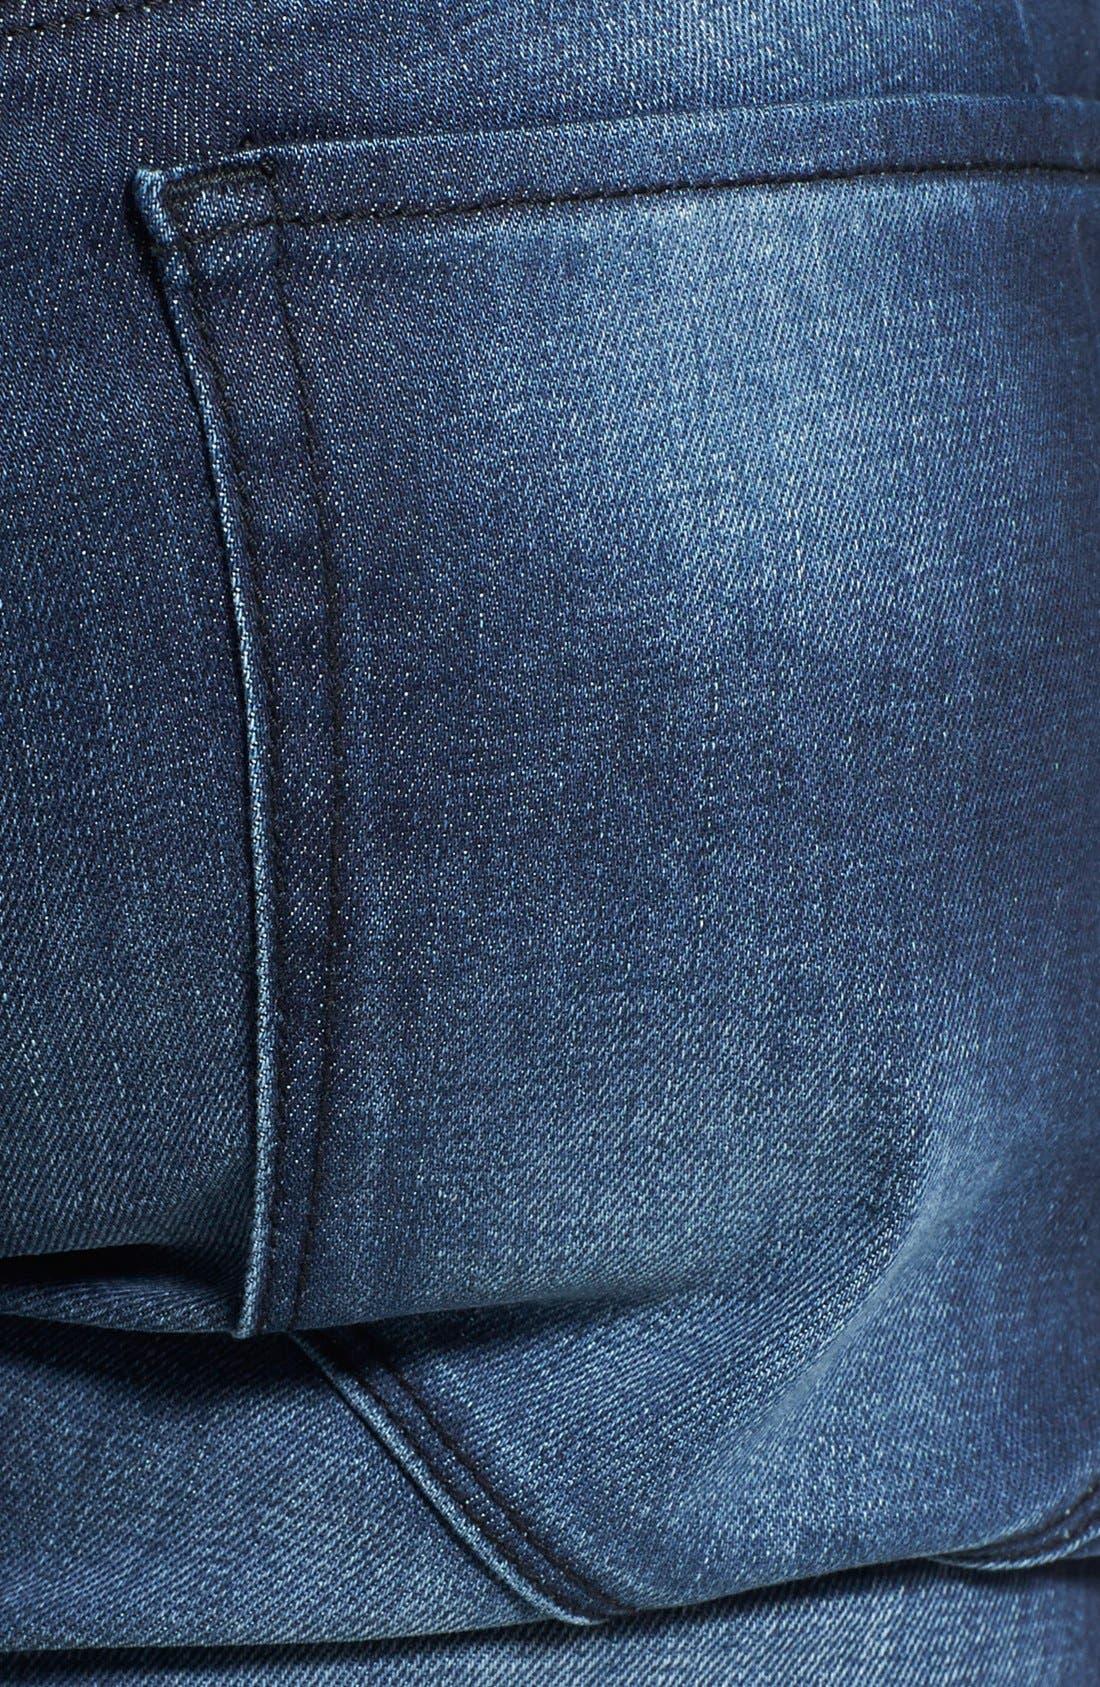 HUGO '708' Slim Fit Jeans,                             Alternate thumbnail 8, color,